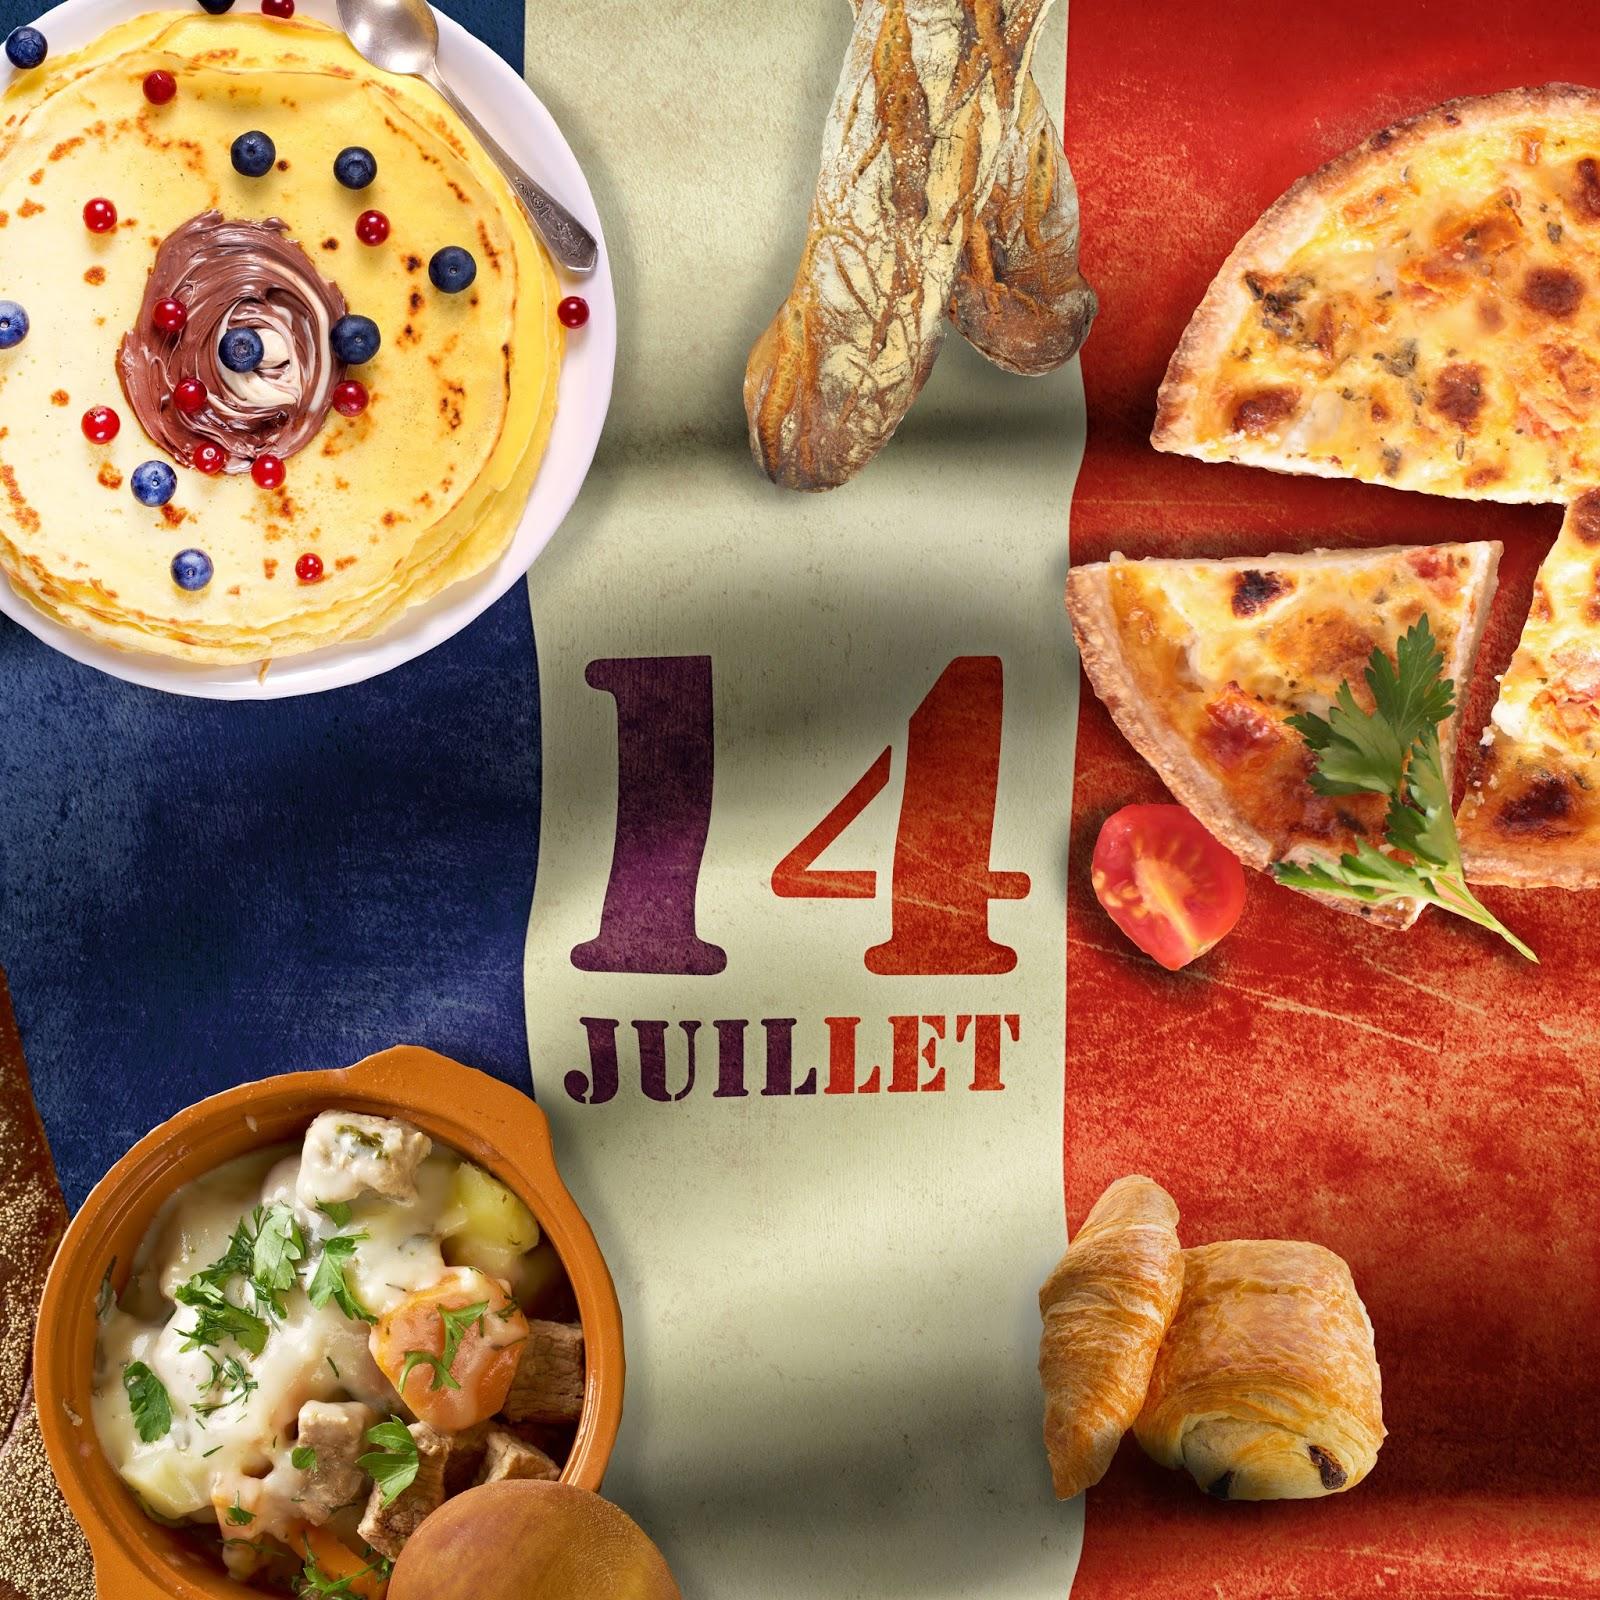 El gourmet urbano buenos aires tour franc s gustativo 14 for Almuerzo en frances